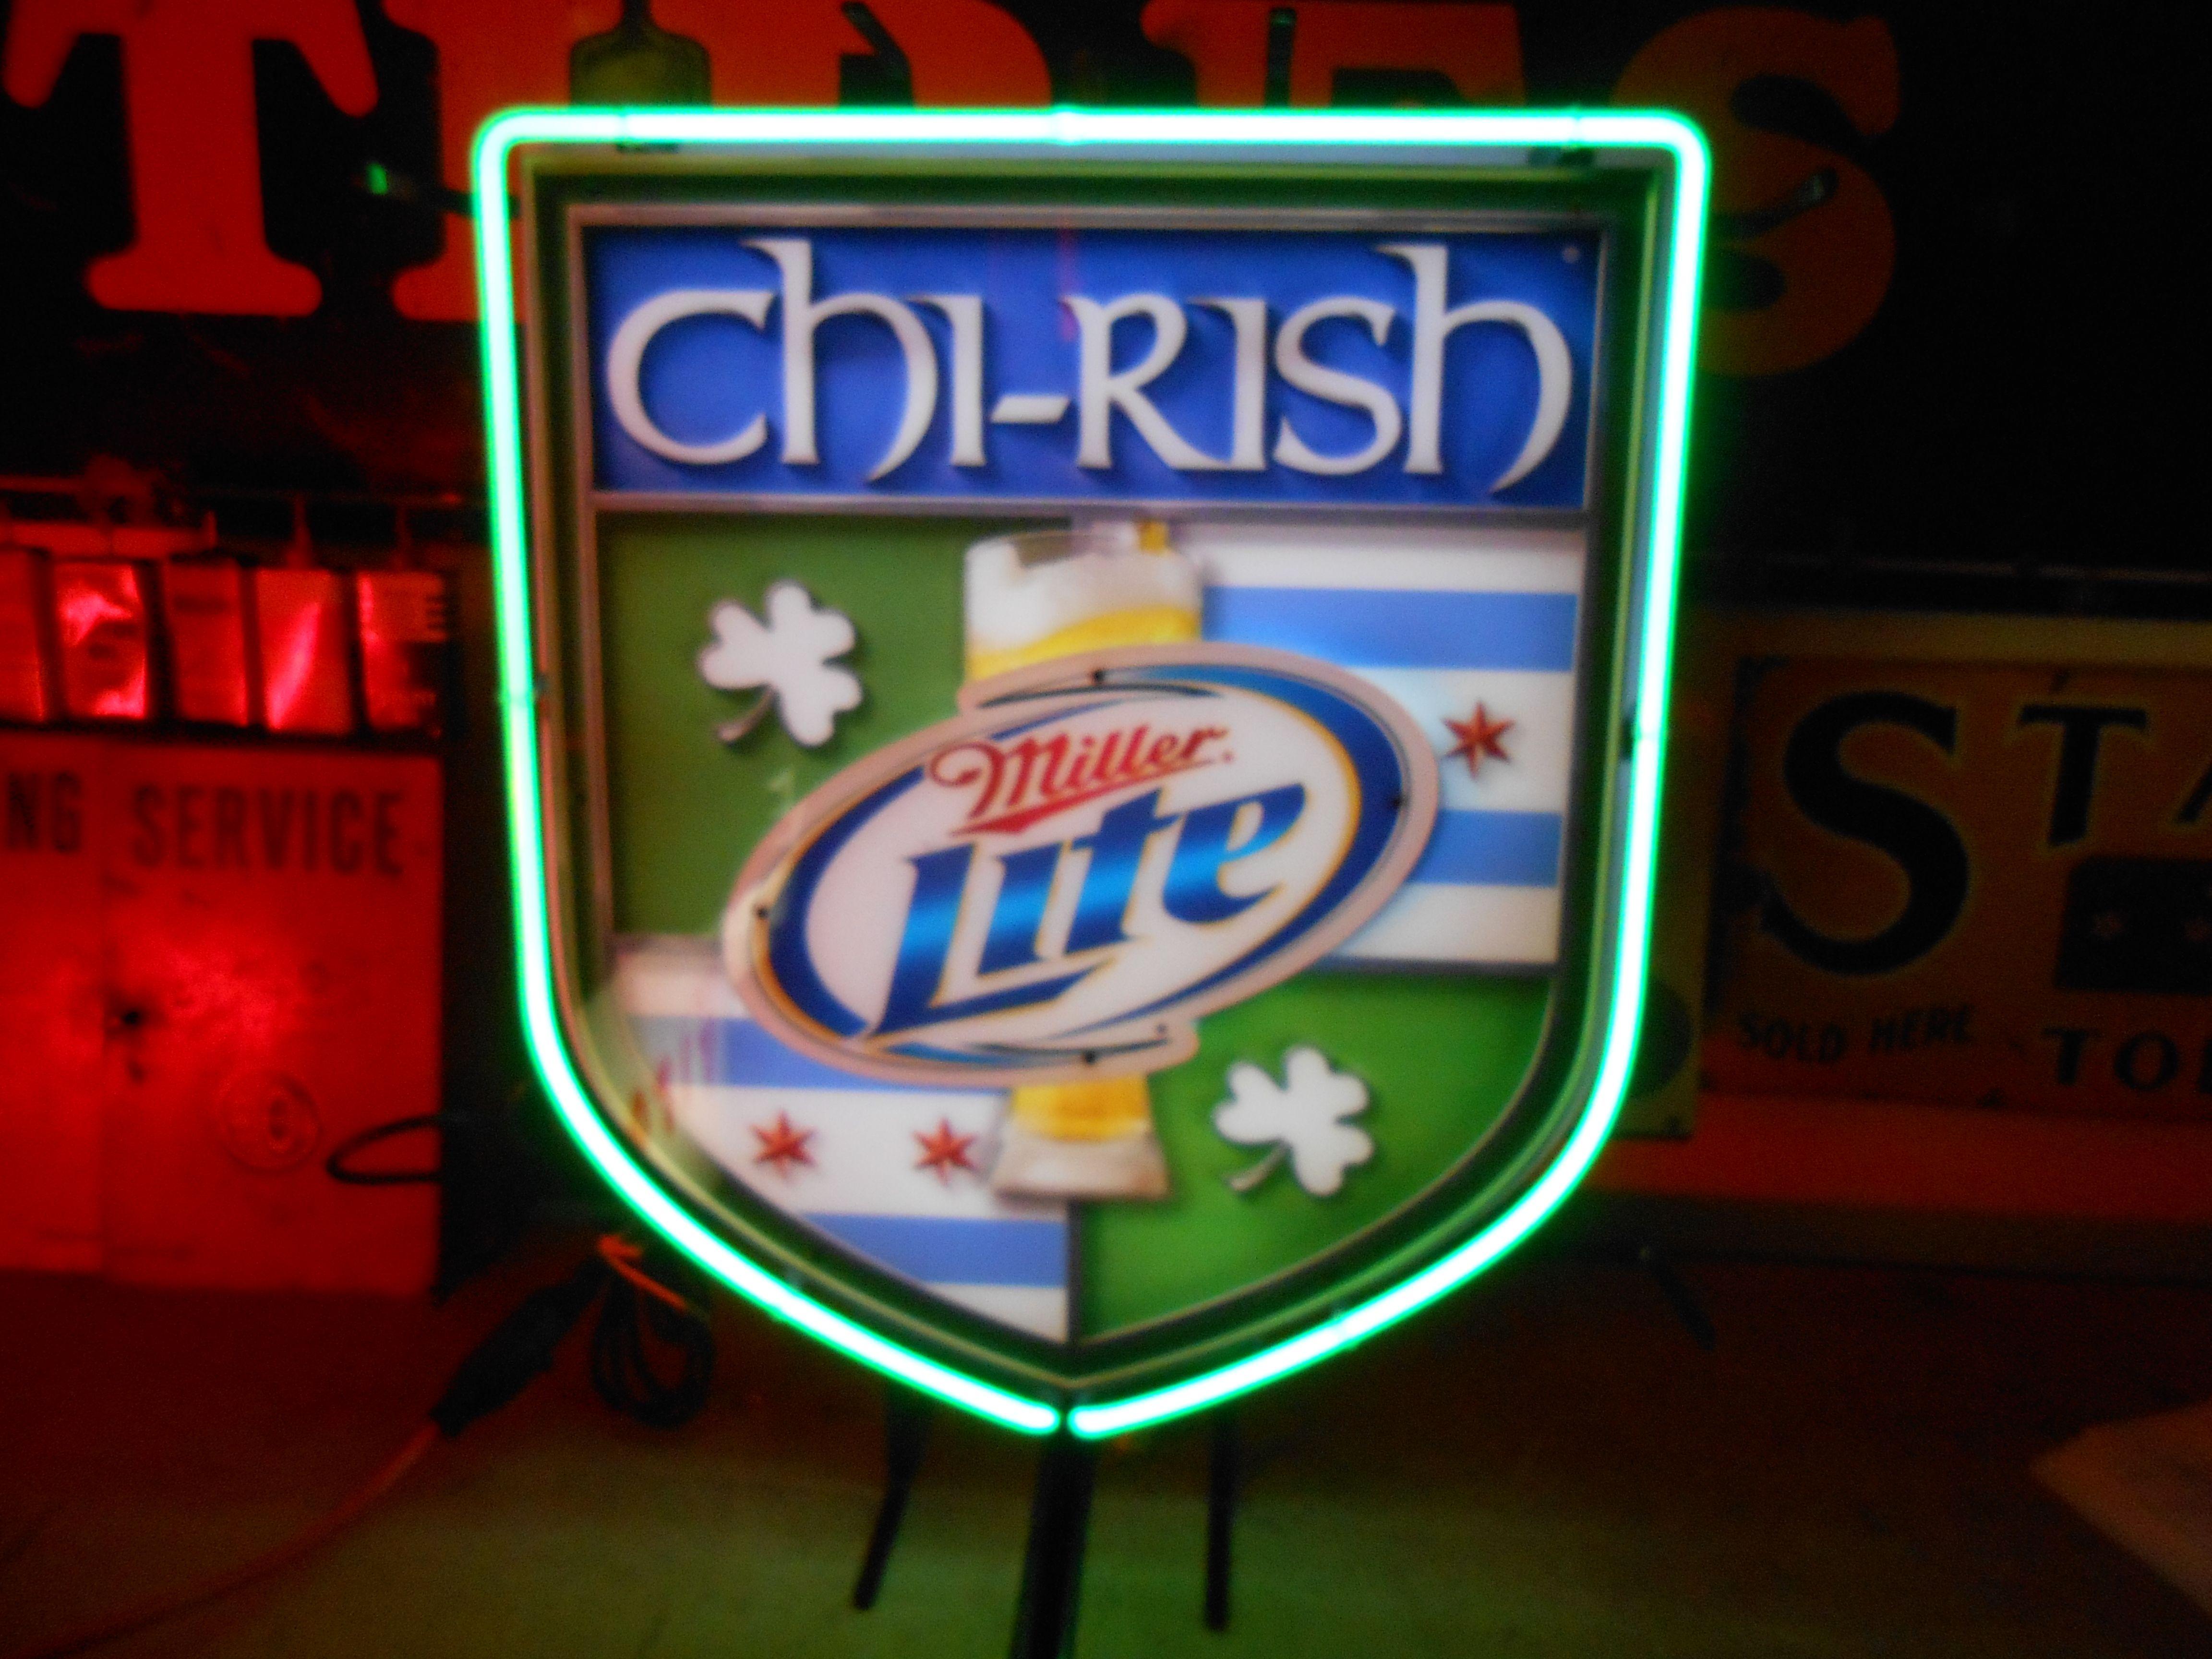 Rare Chi-rish Miller Lite Neon Bar Sign Circa 2007